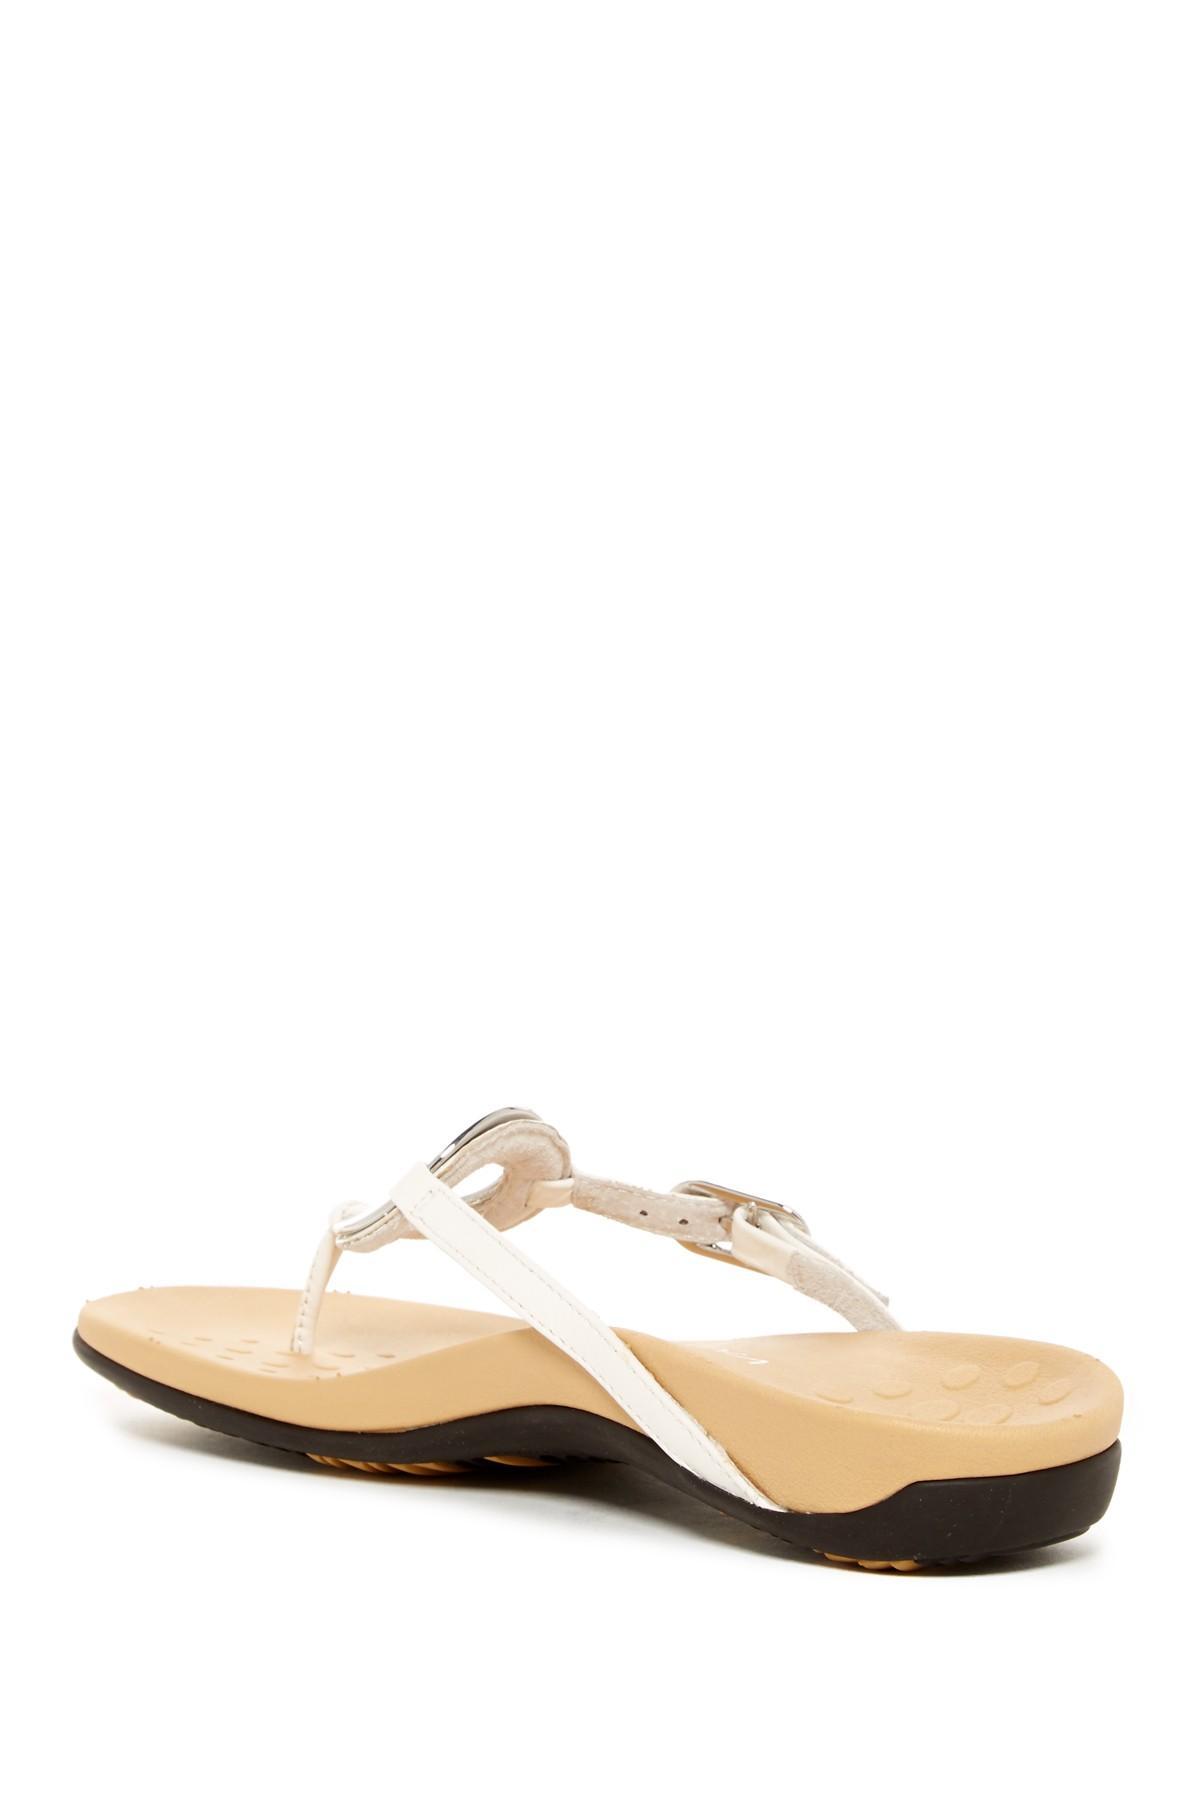 Merrell Shoes For Women Wide Width